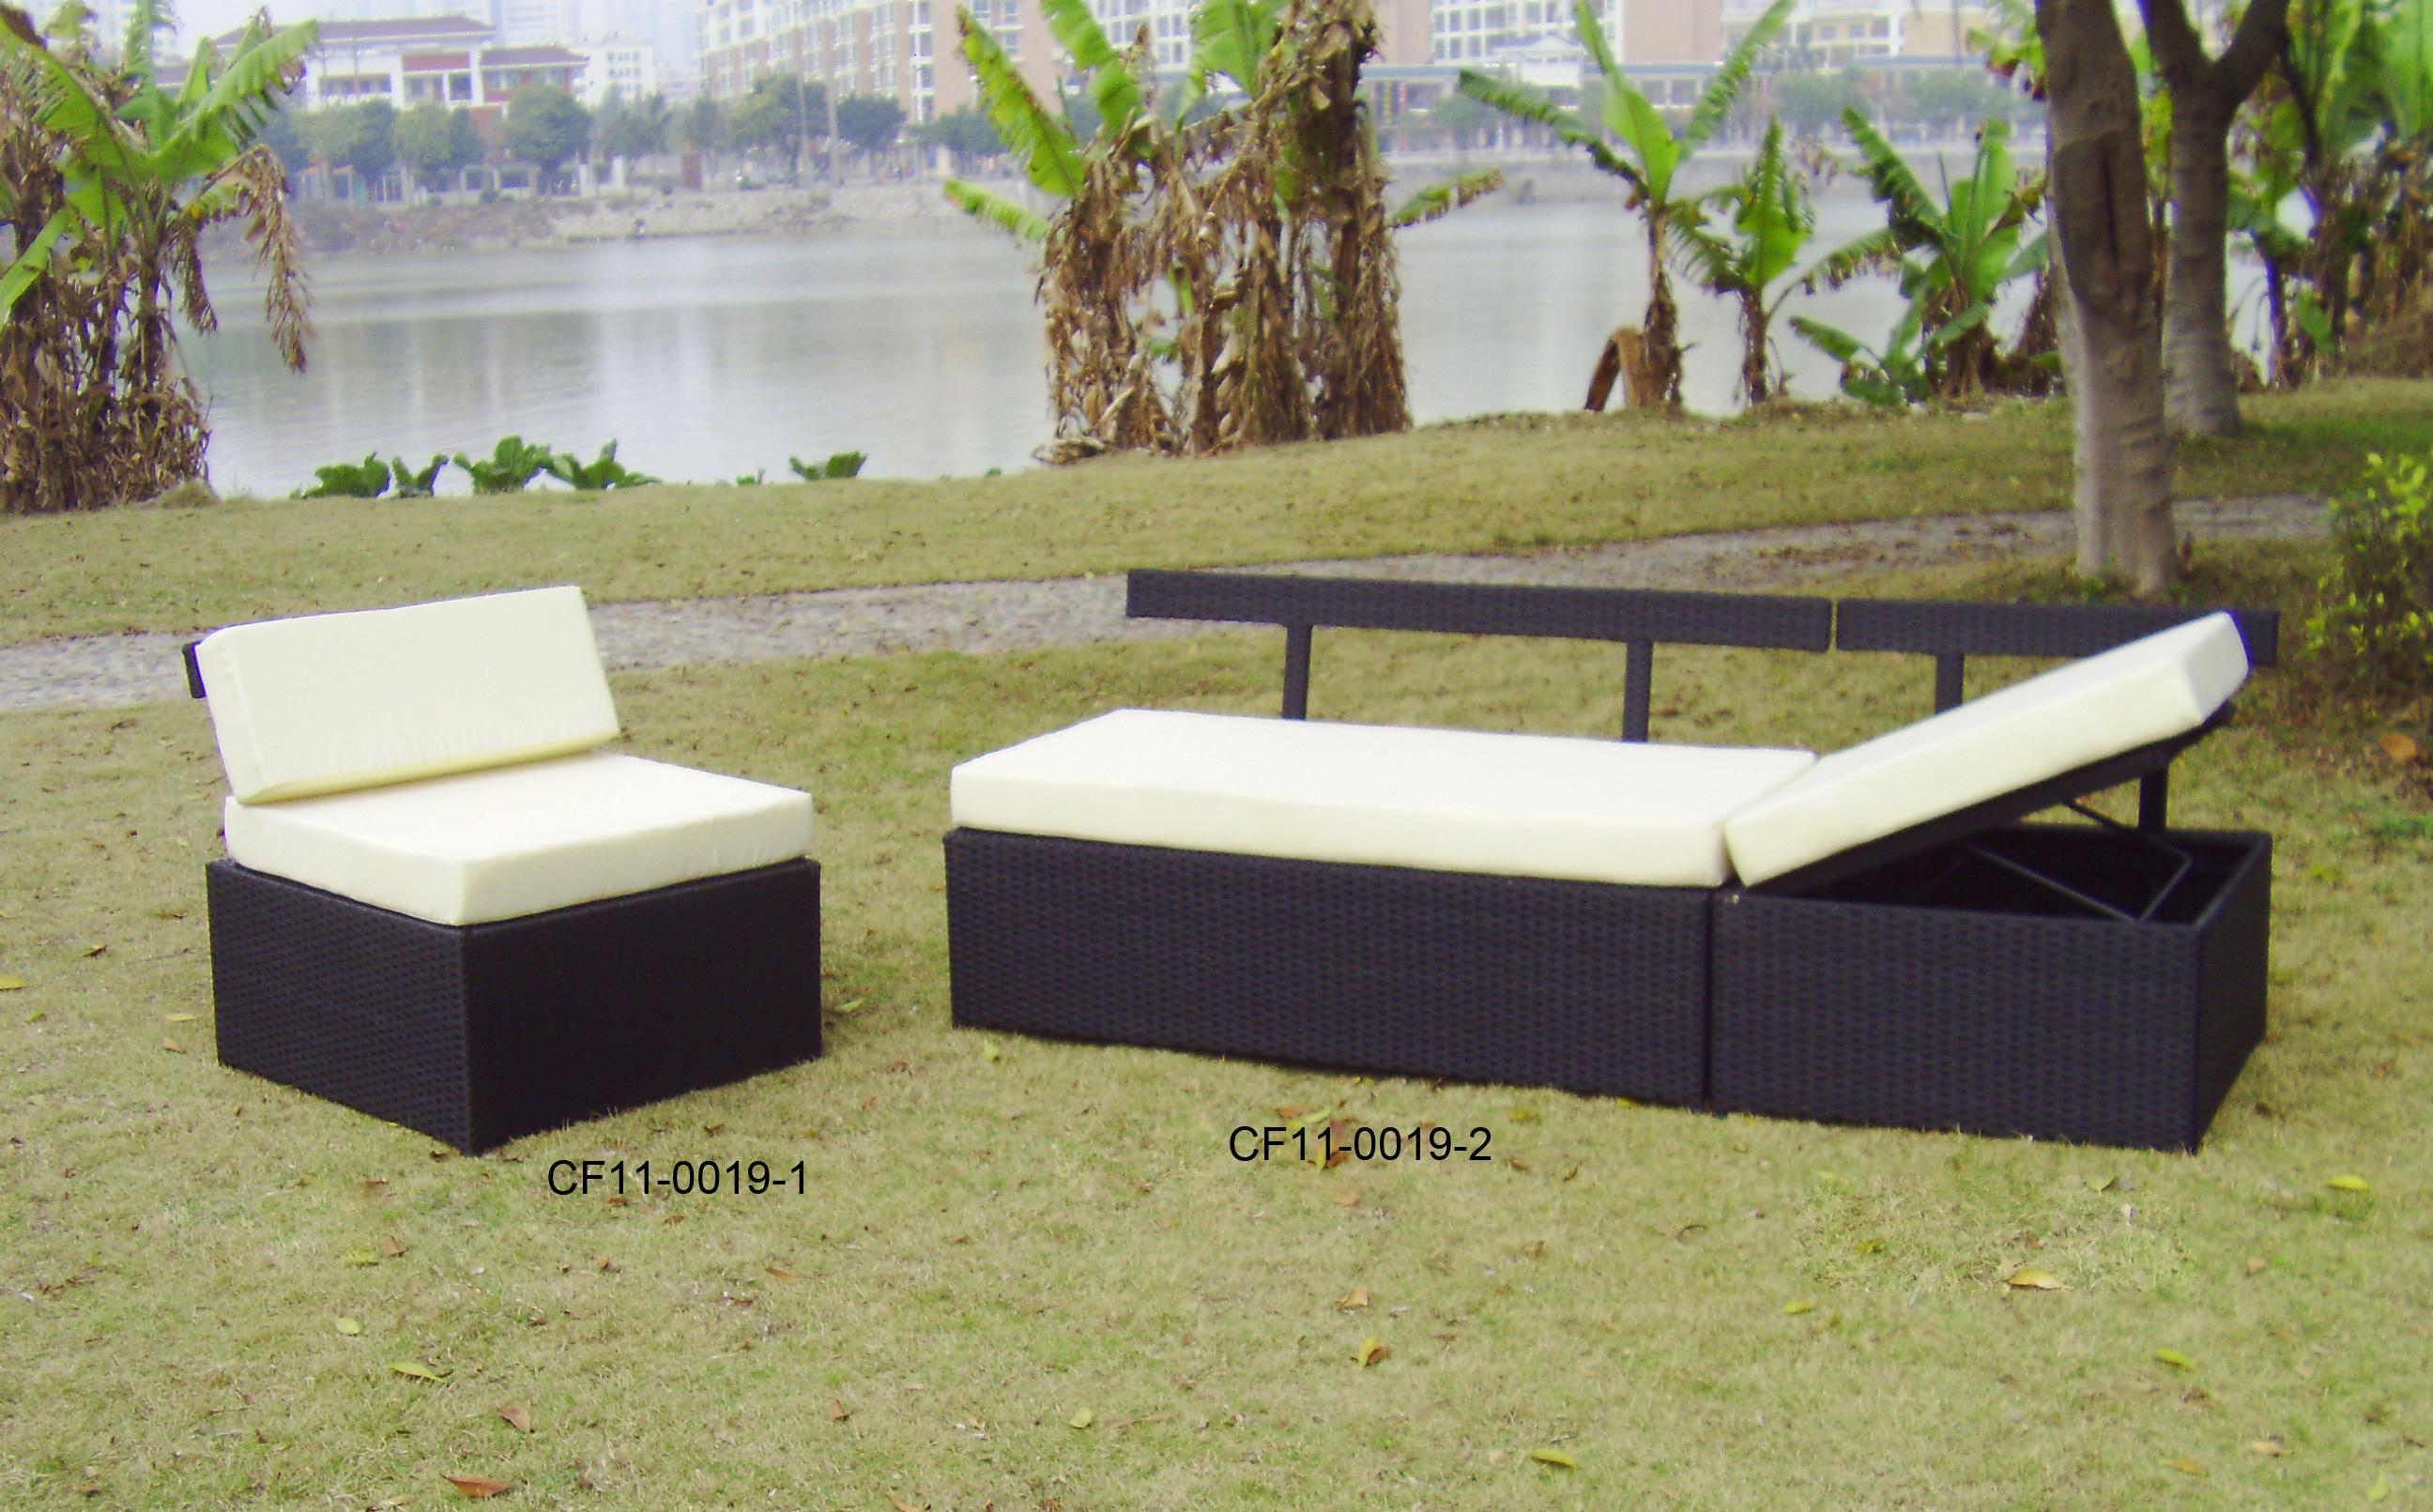 Rattan Modern Outdoor Garden Furniture One Lover Sofa Two Single Sofa